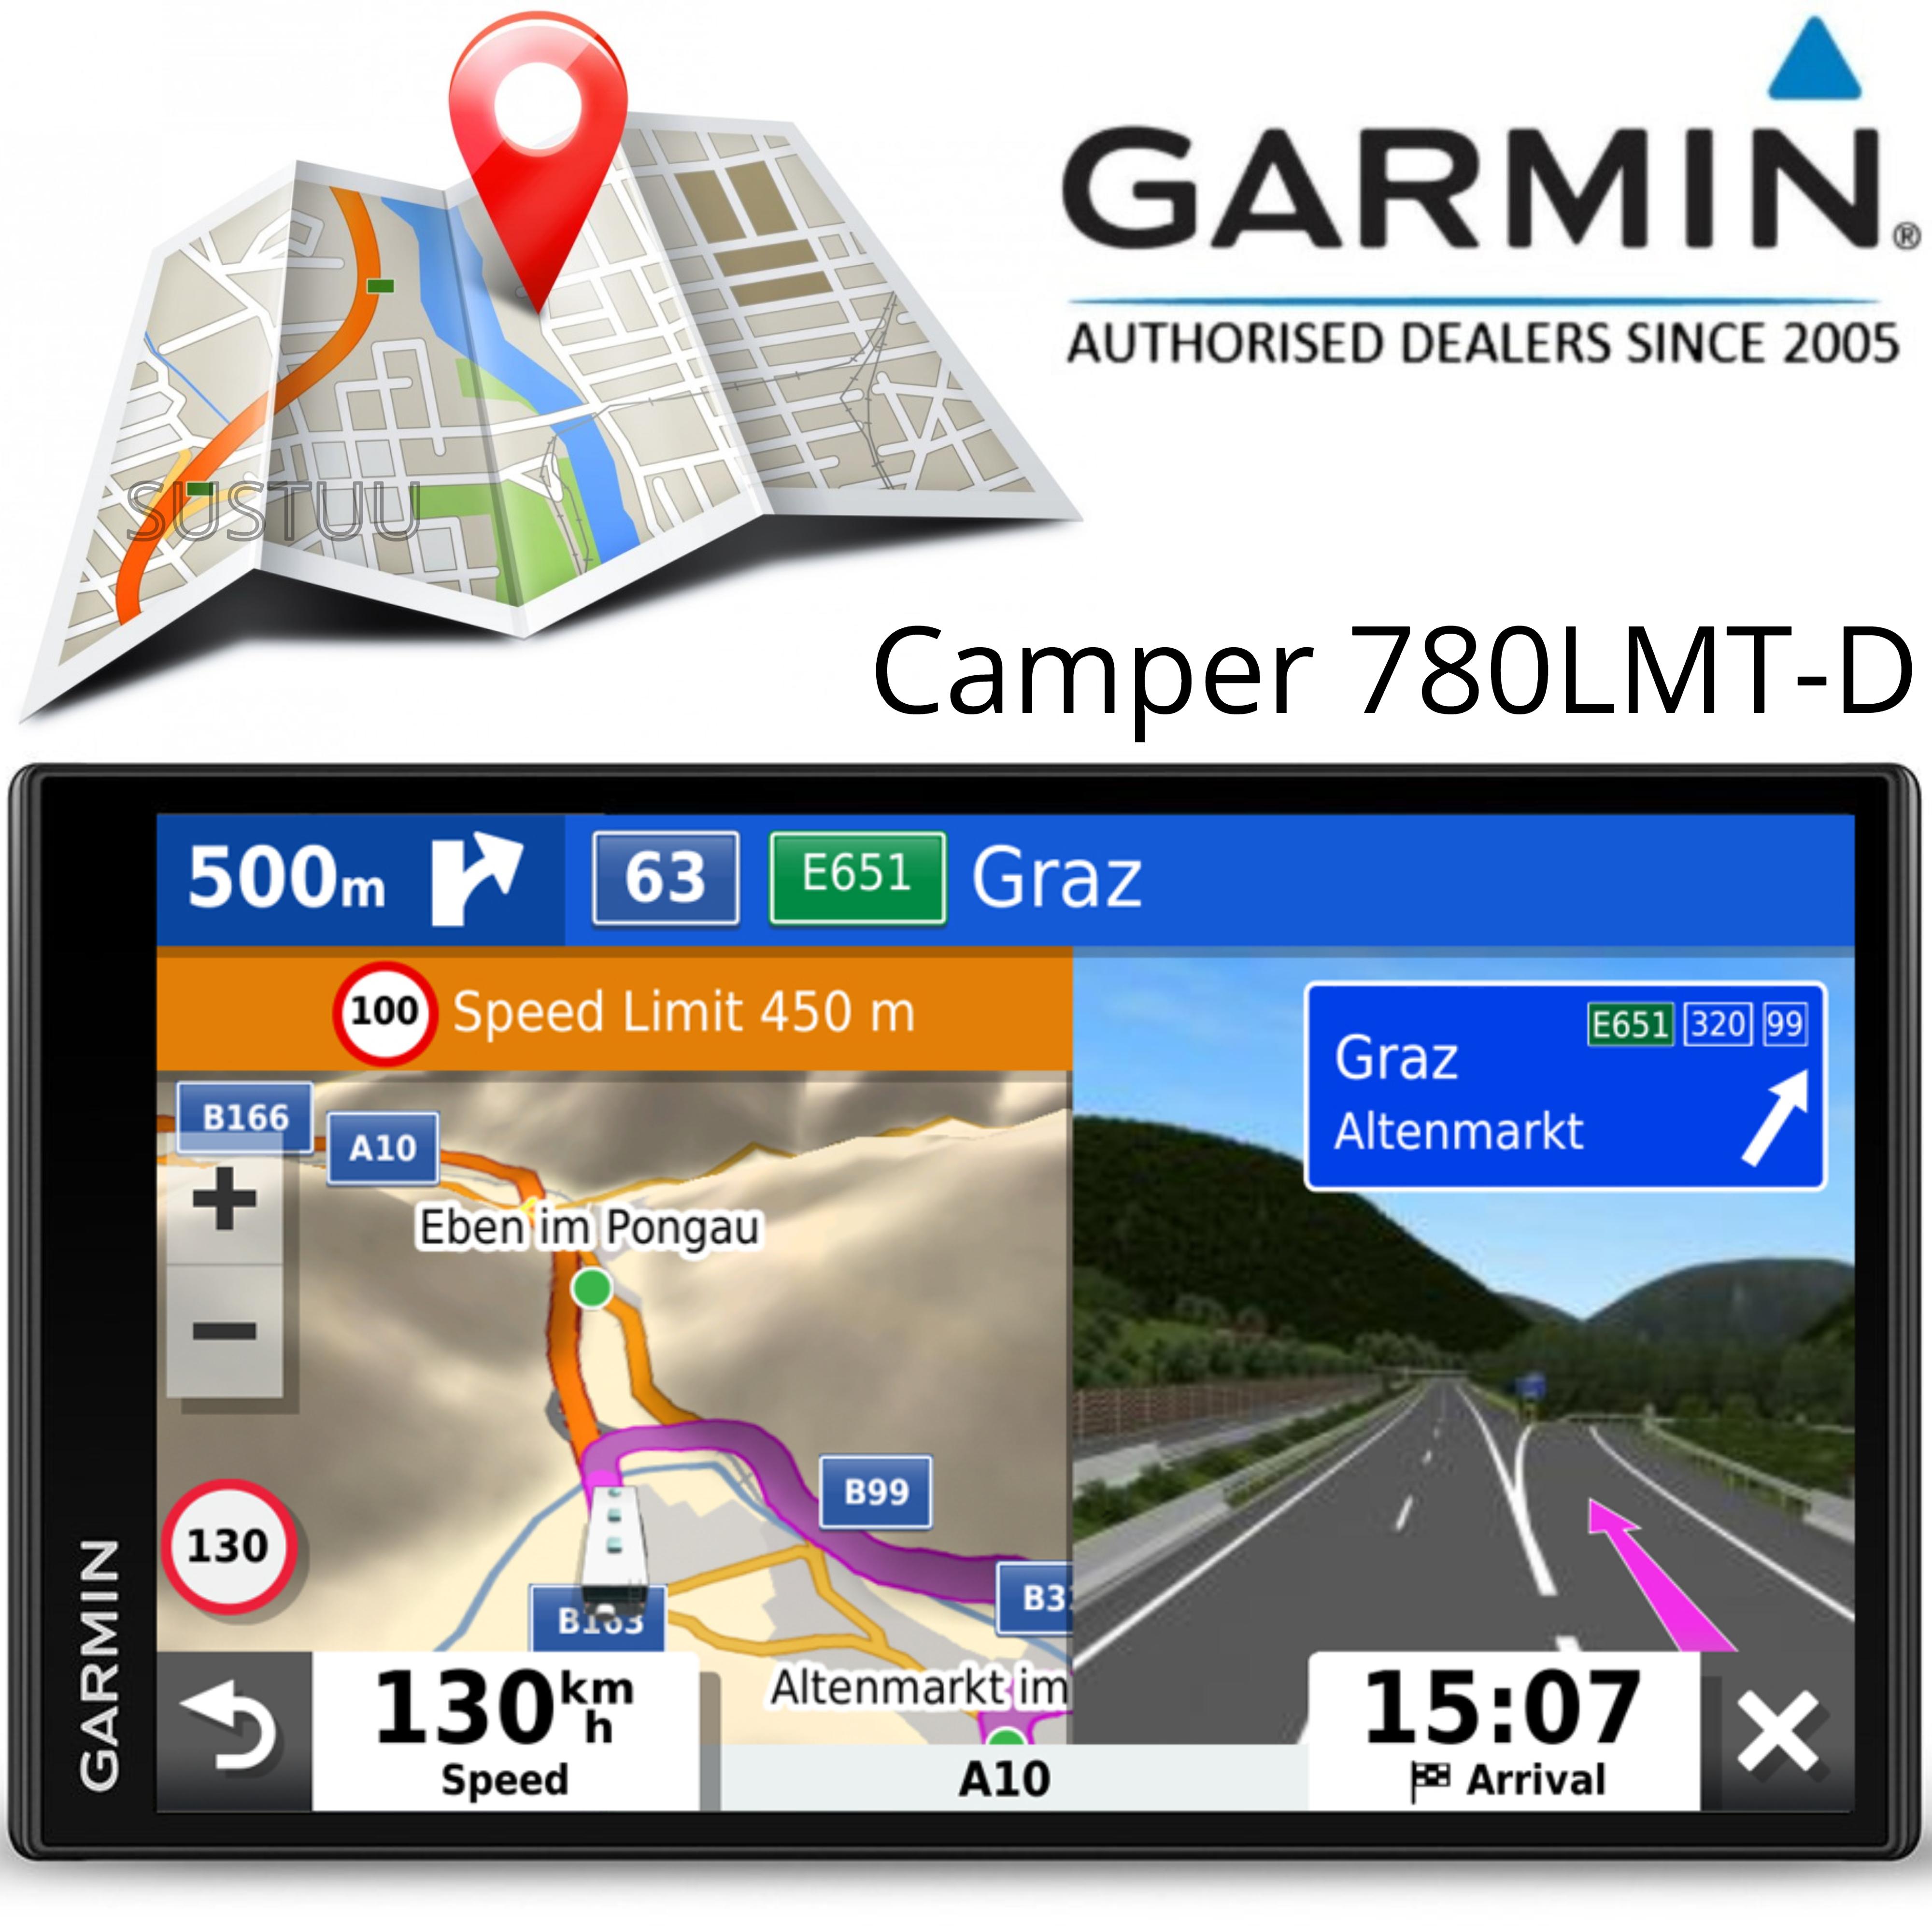 Garmin Camper 780LMT-D Motorhome Caravan GPS SatNav   Lifetime Map+Digital Traffic